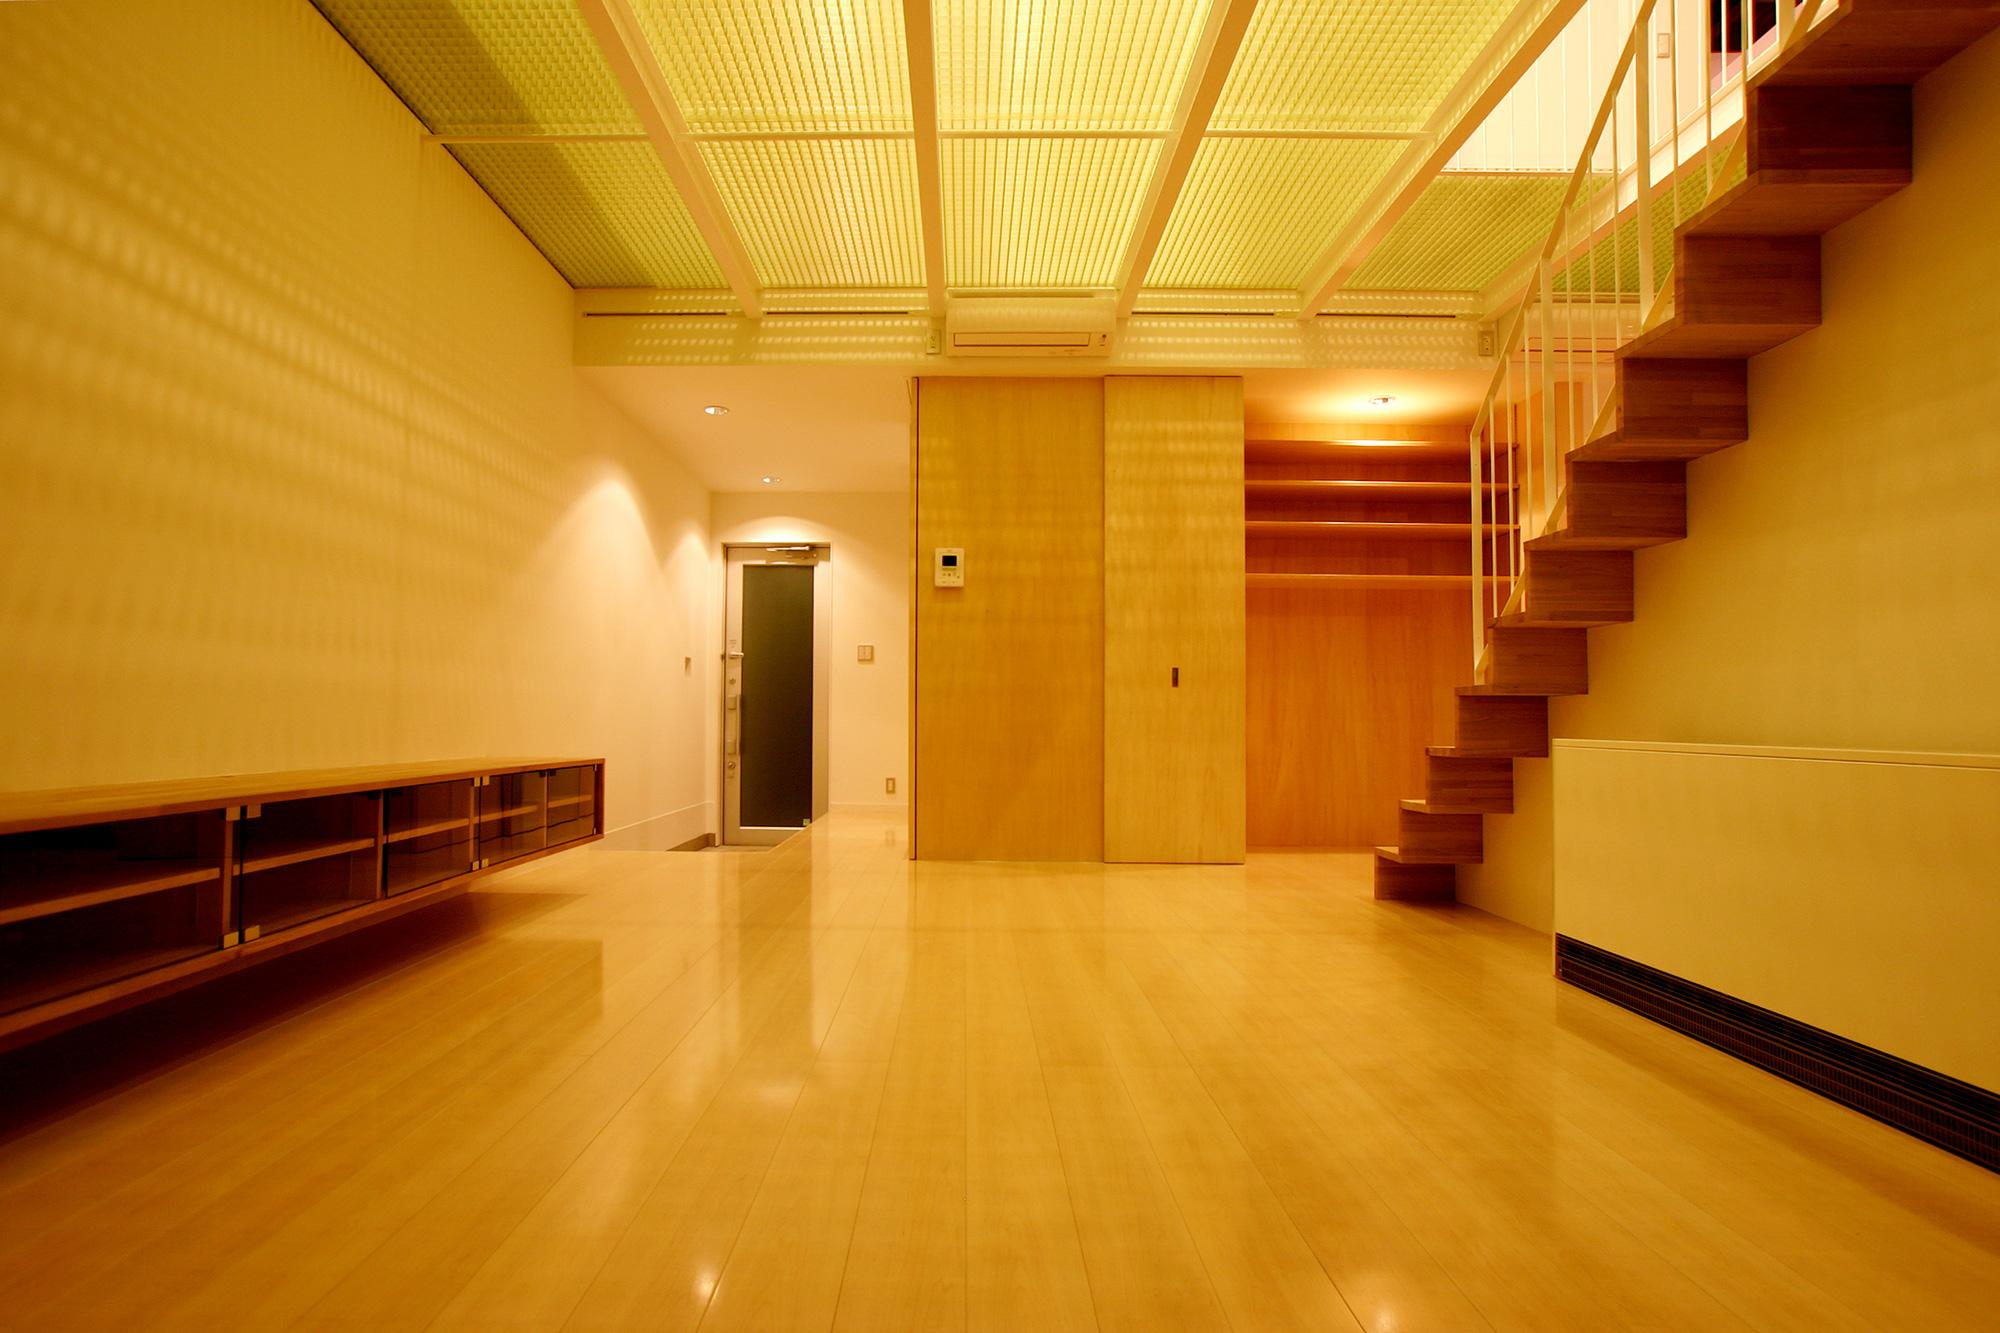 K-House <空中リビングのある家>の部屋 半透明天井から照明の光が漏れるリビング